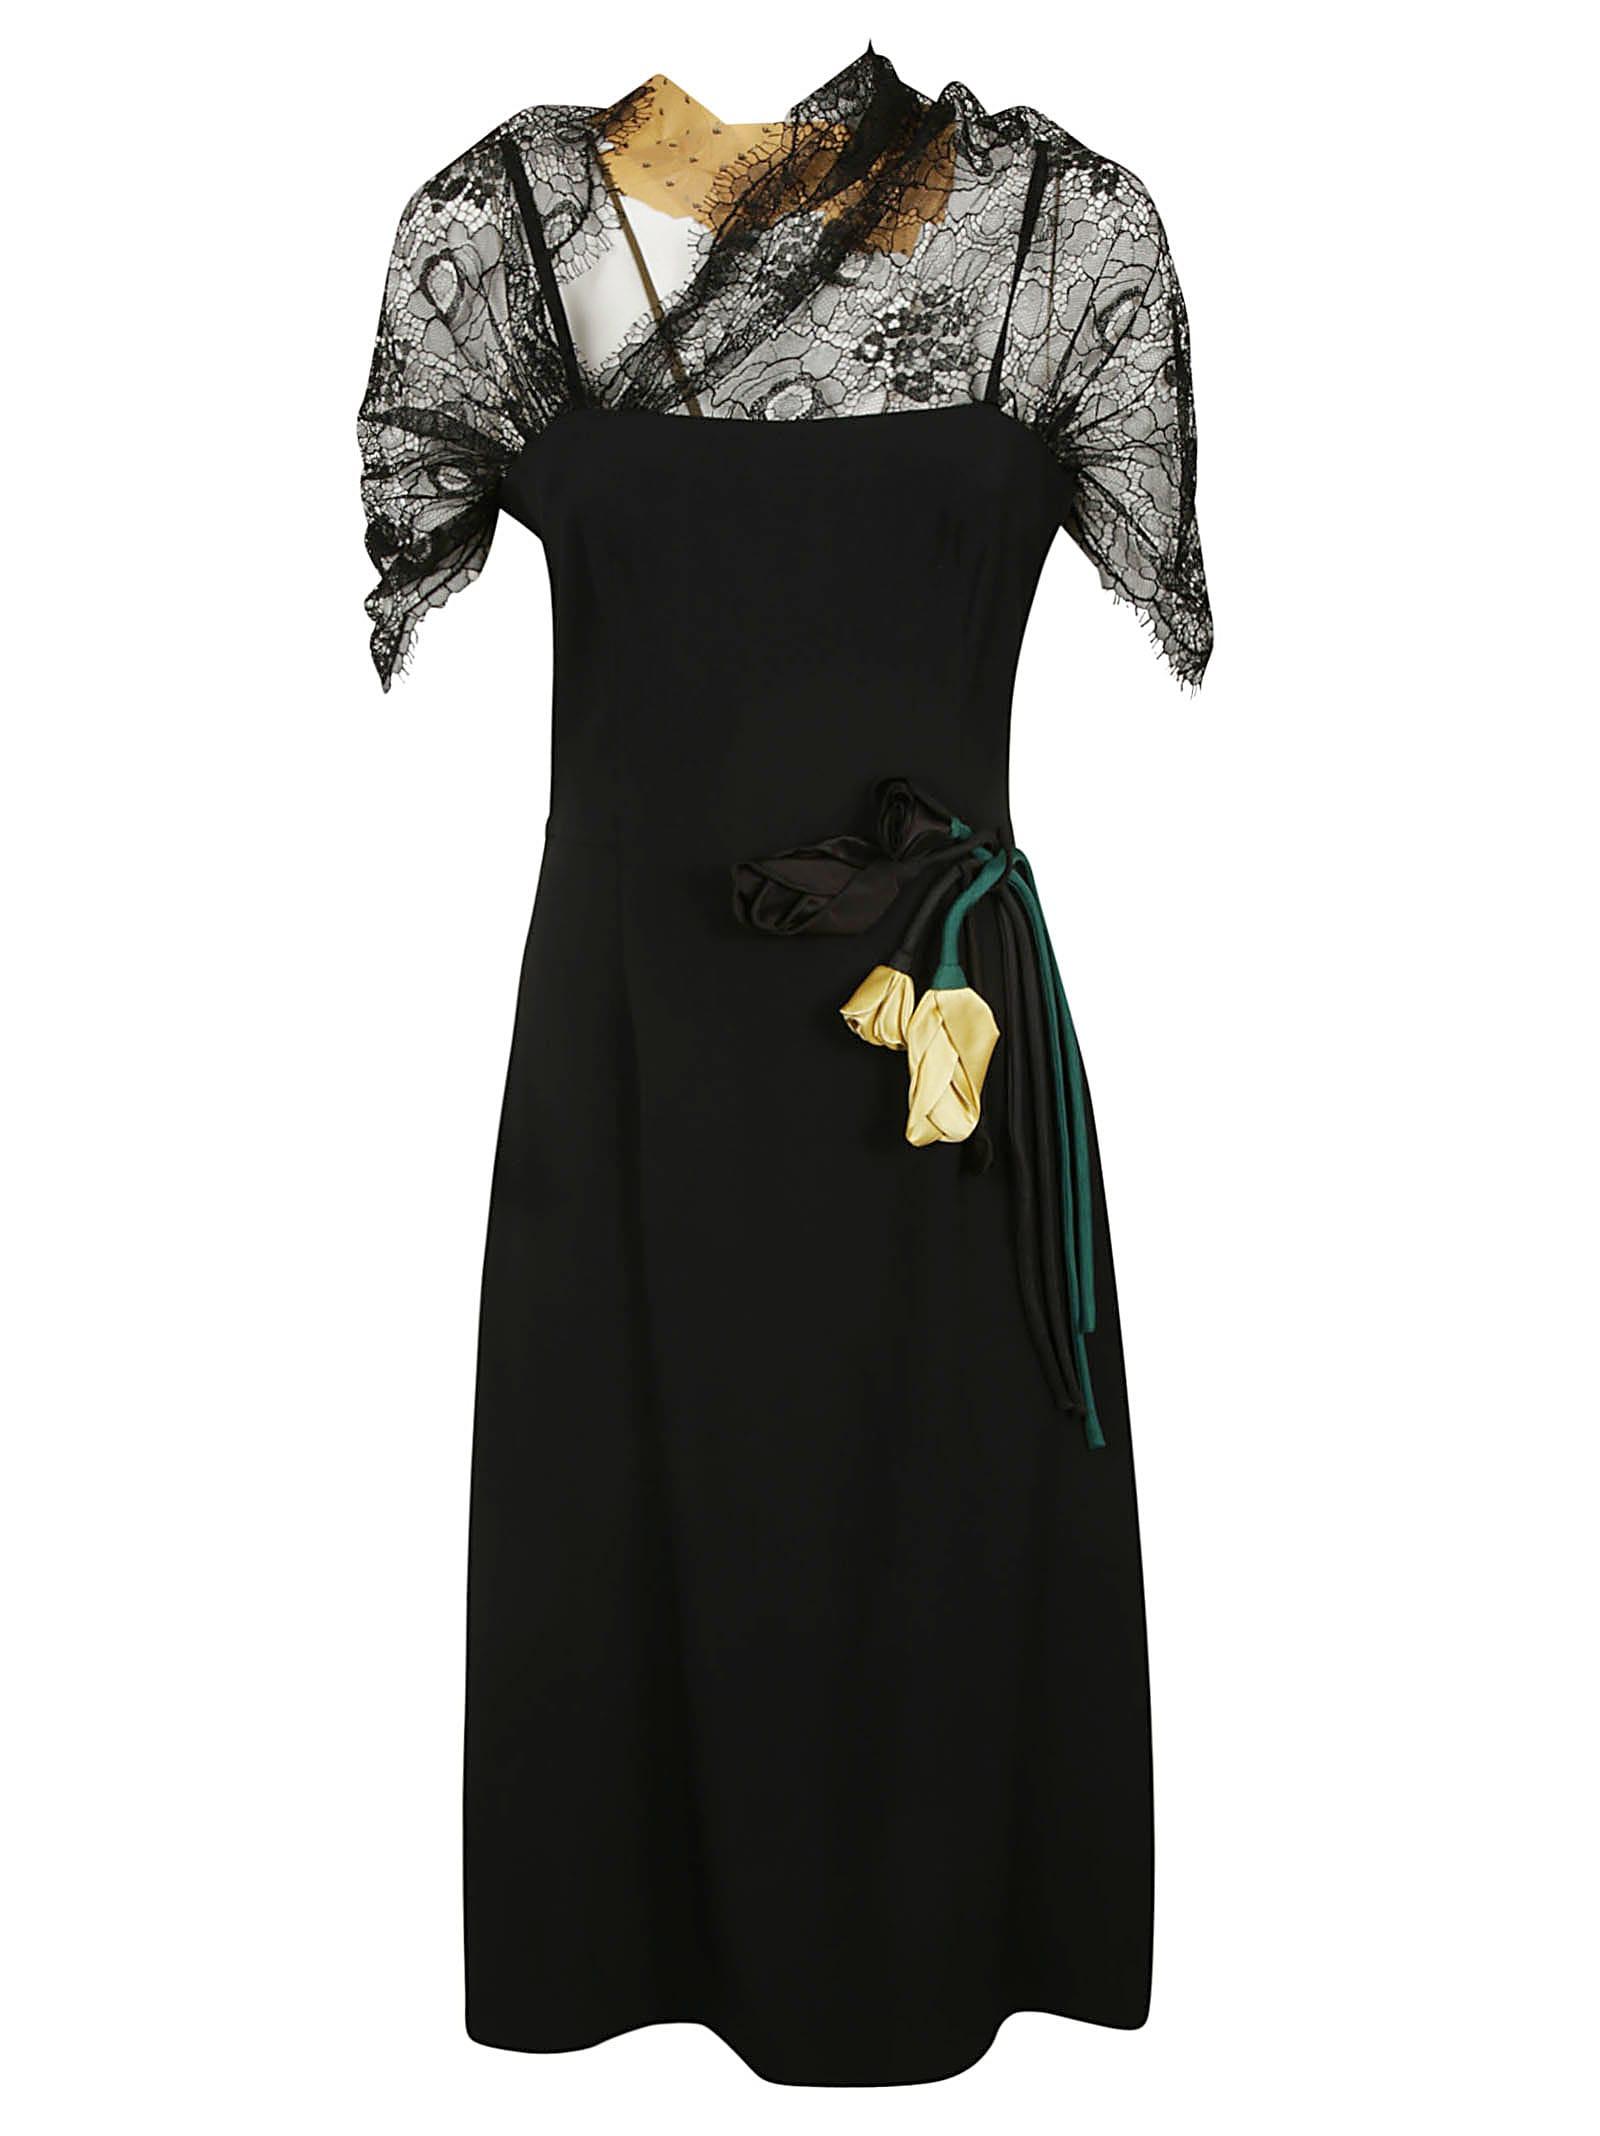 Prada Laced Dress